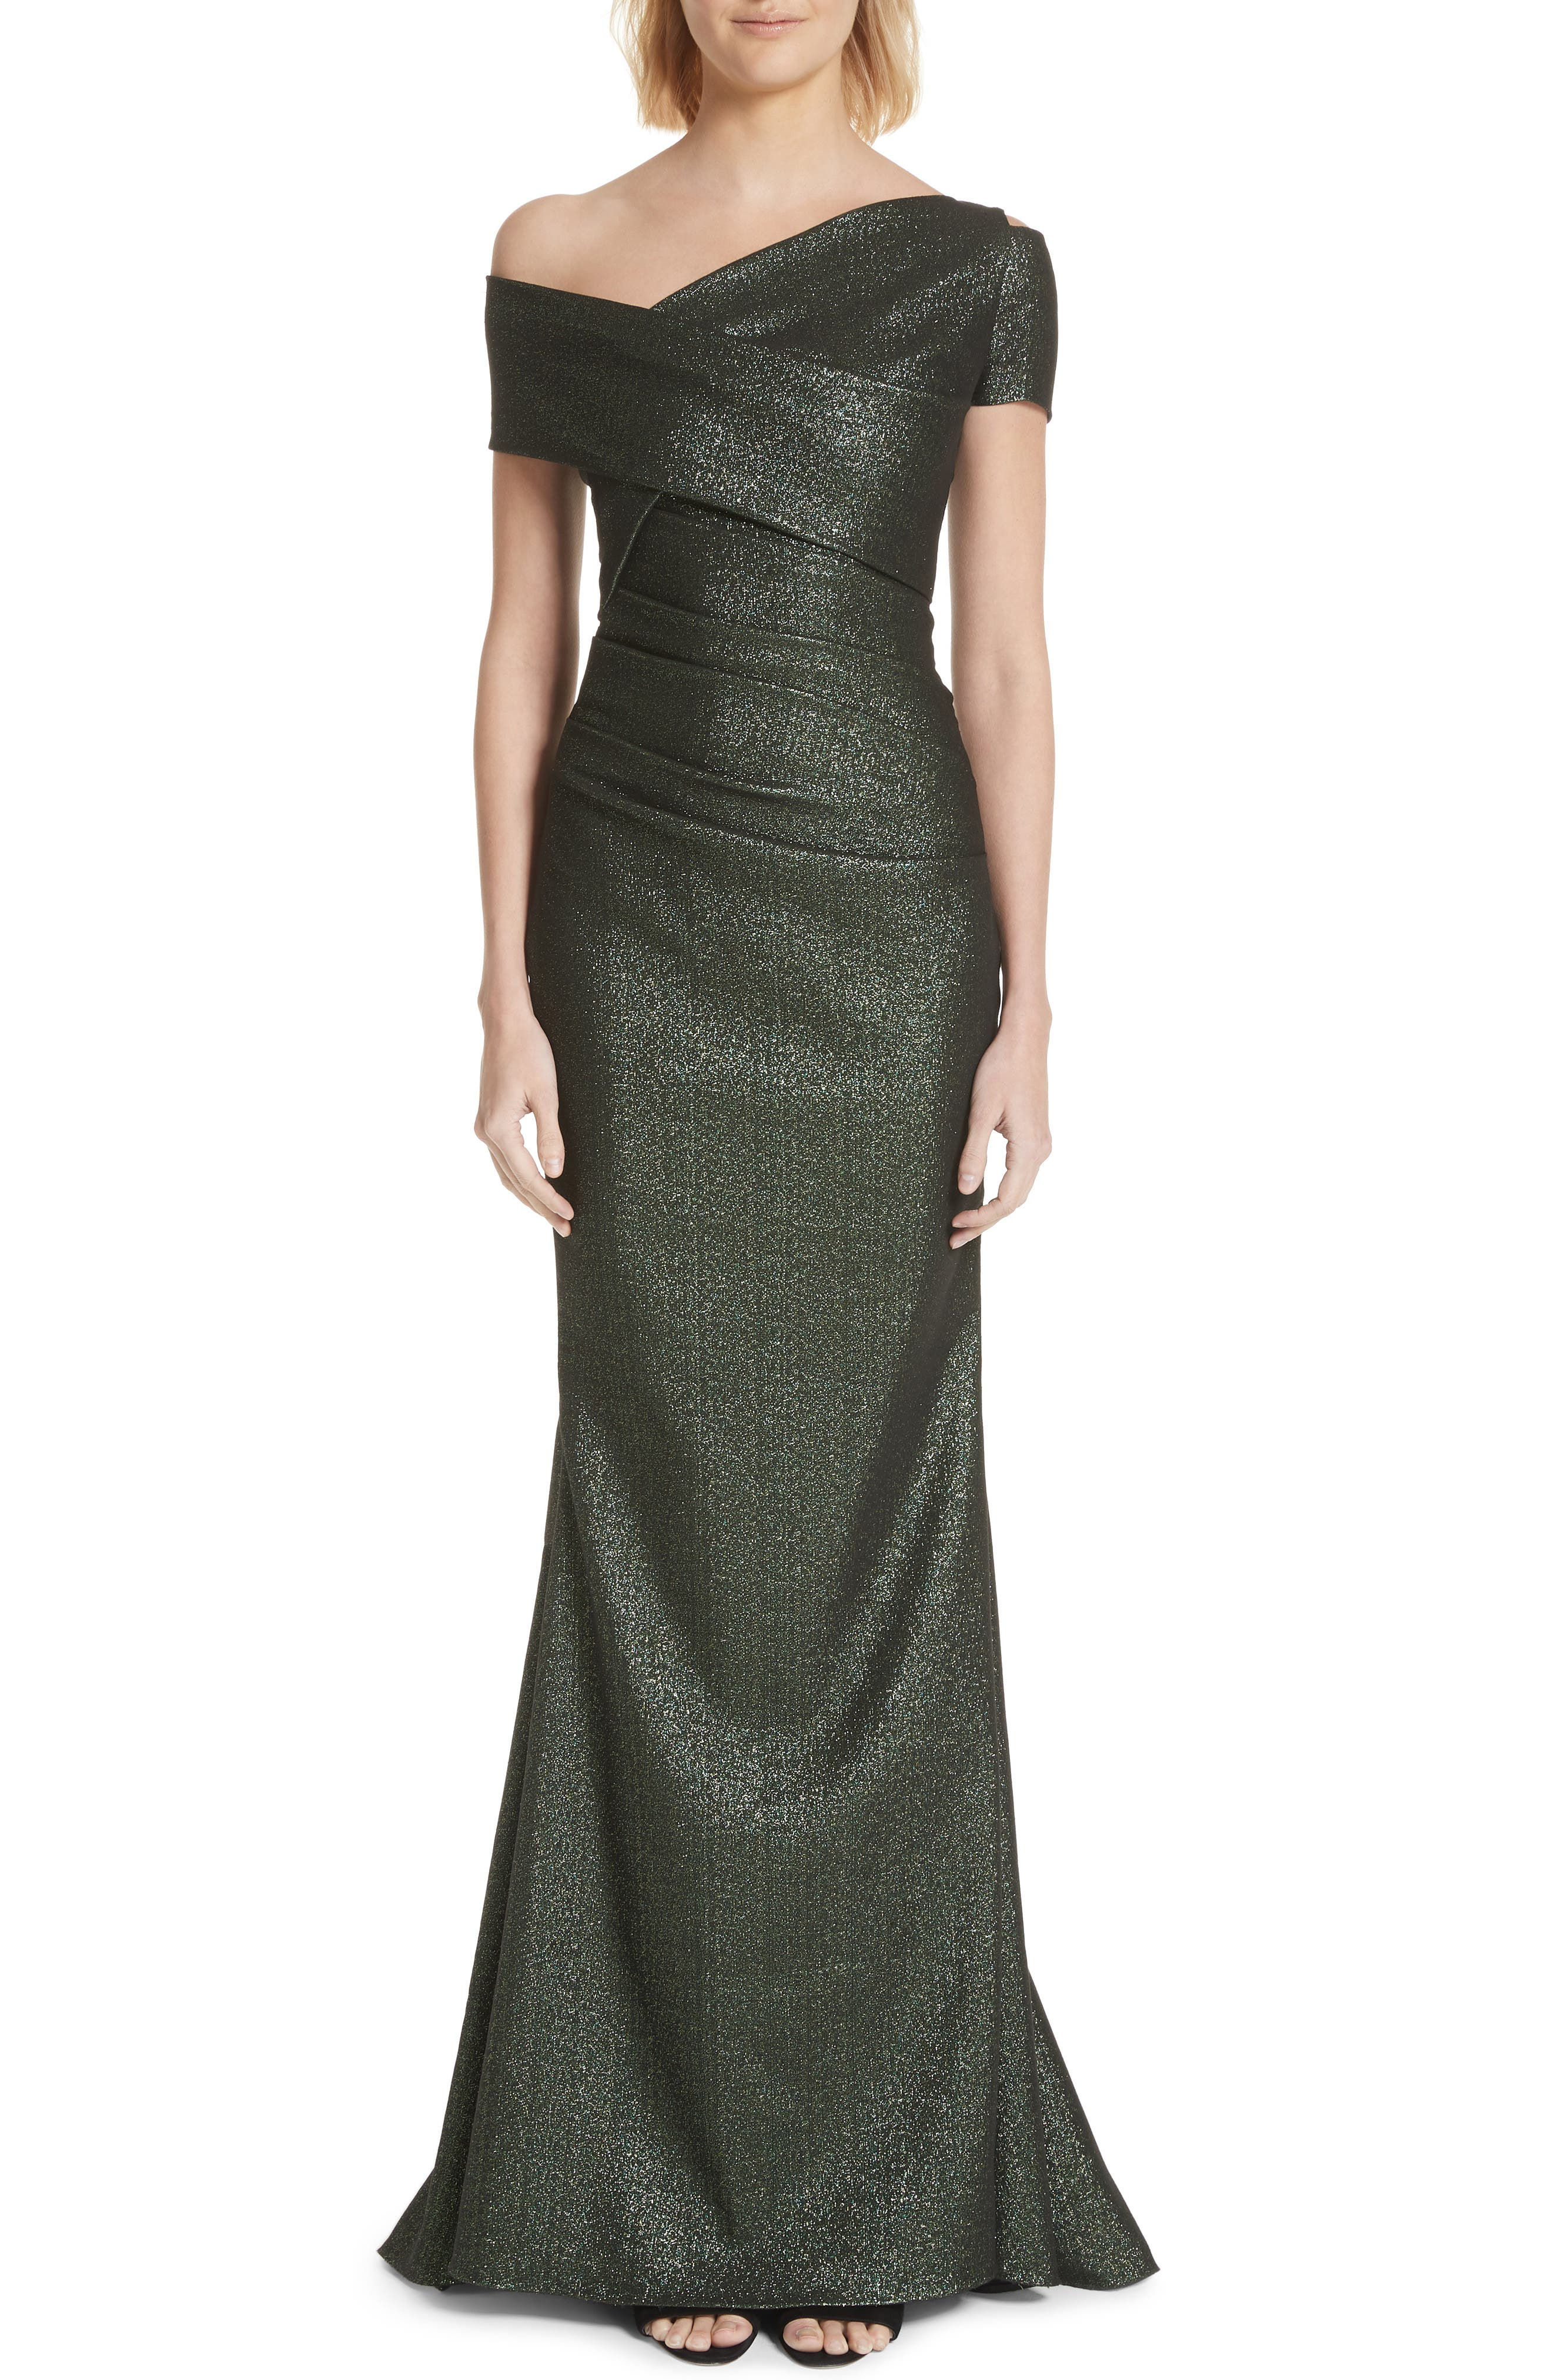 Talbot Runhof Glitter Knit Asymmetrical Mermaid Gown, Green